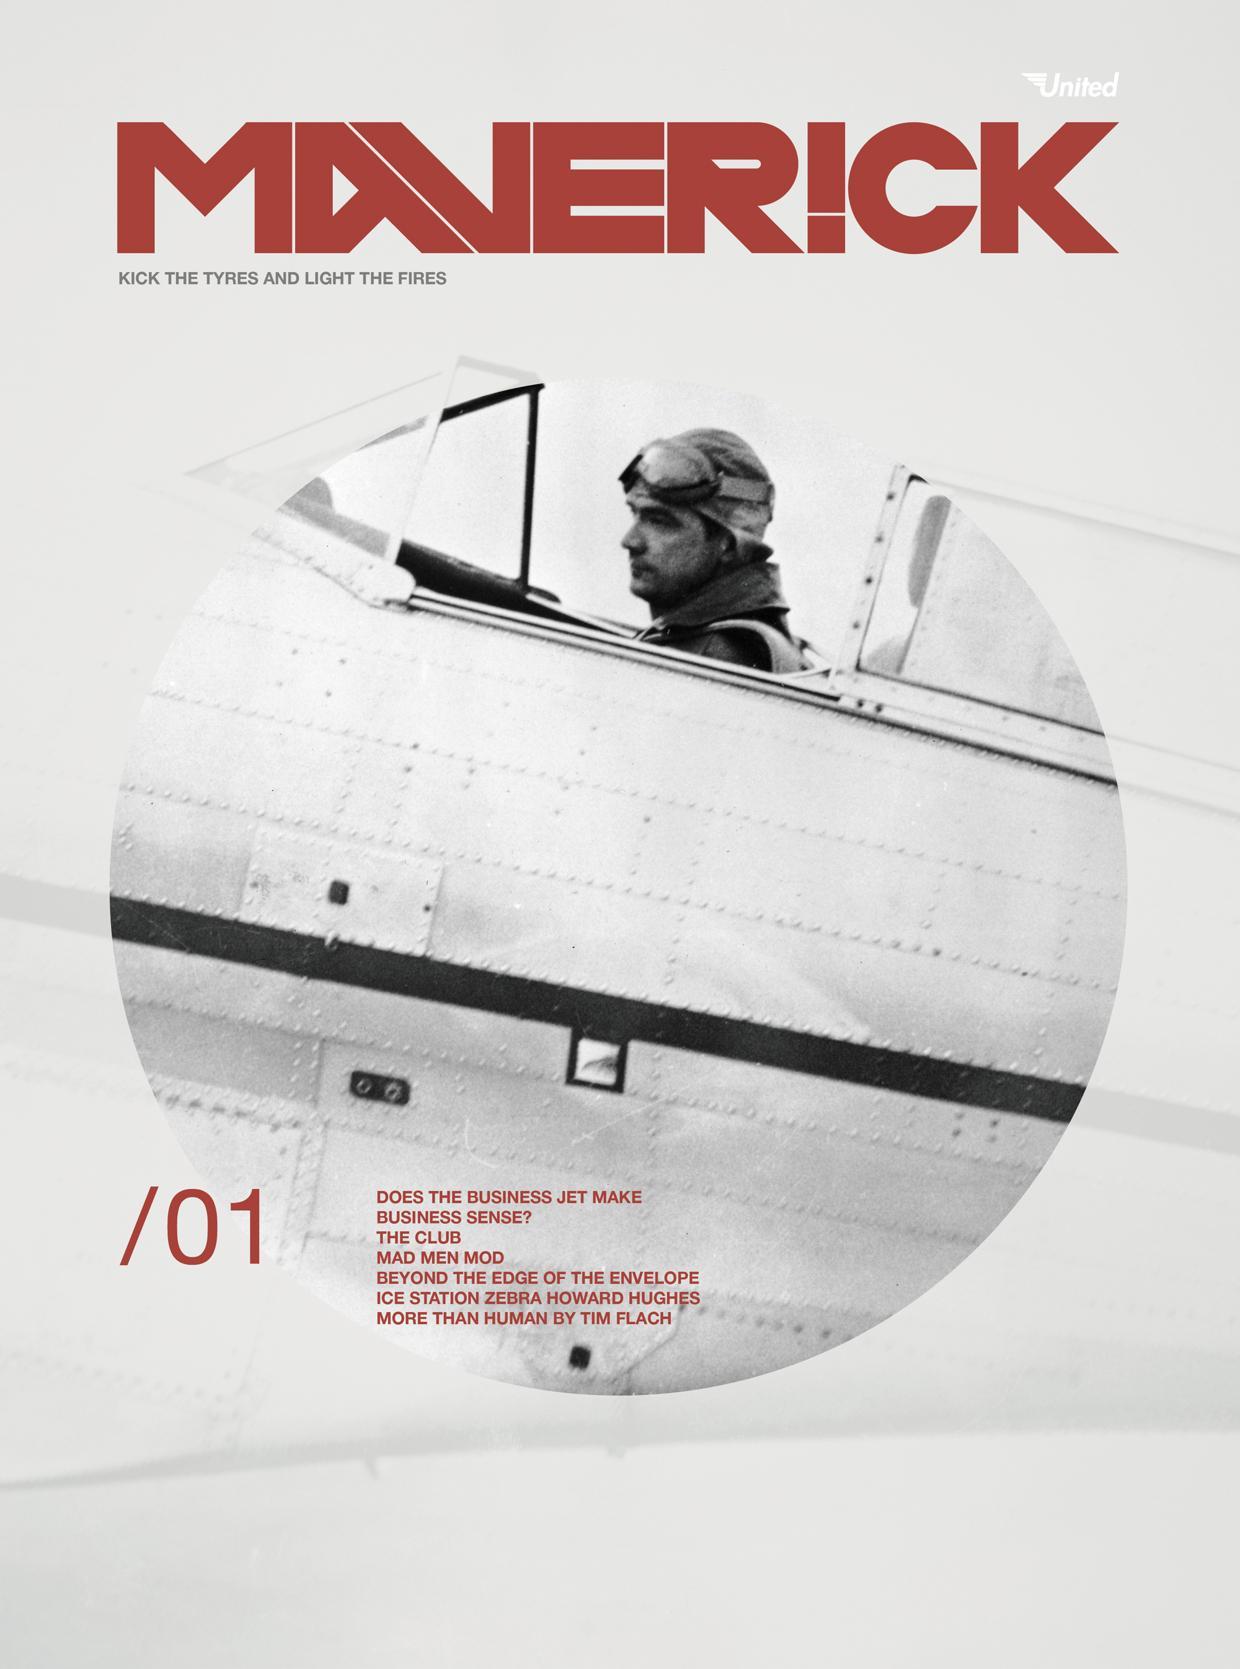 Maverick Magazine /01 on